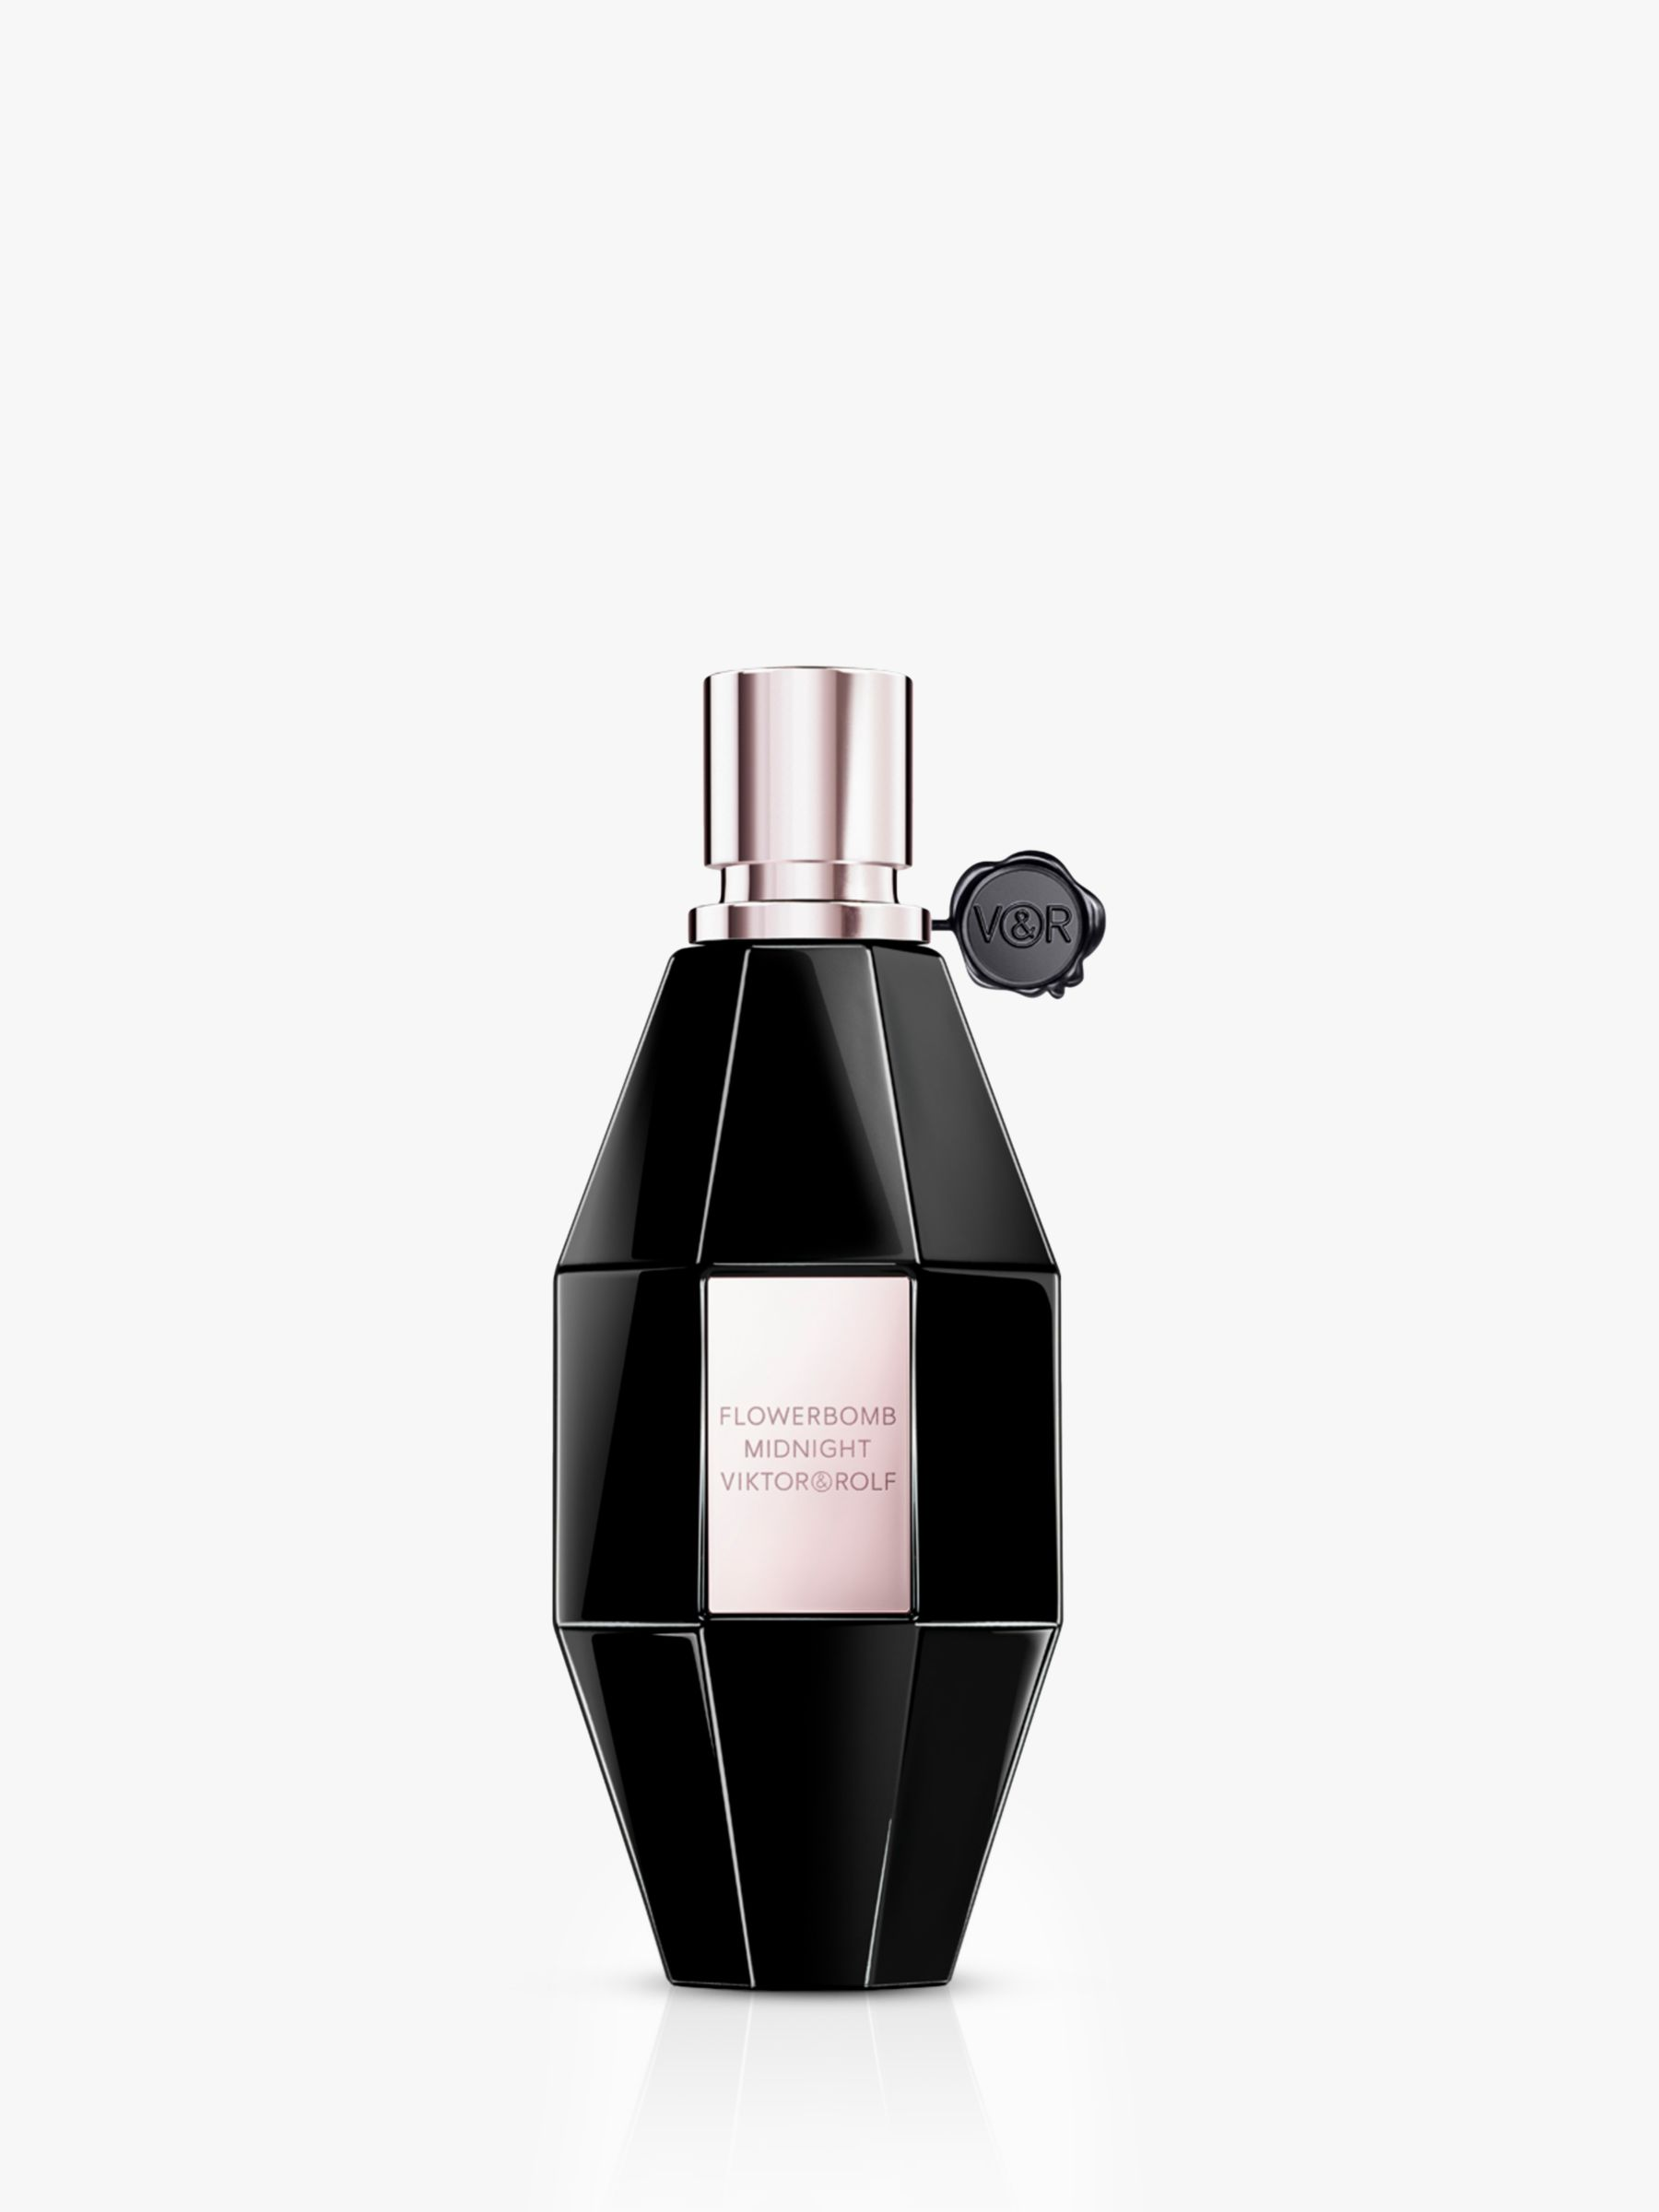 Viktor & Rolf Viktor & Rolf Flowerbomb Midnight Eau de Parfum